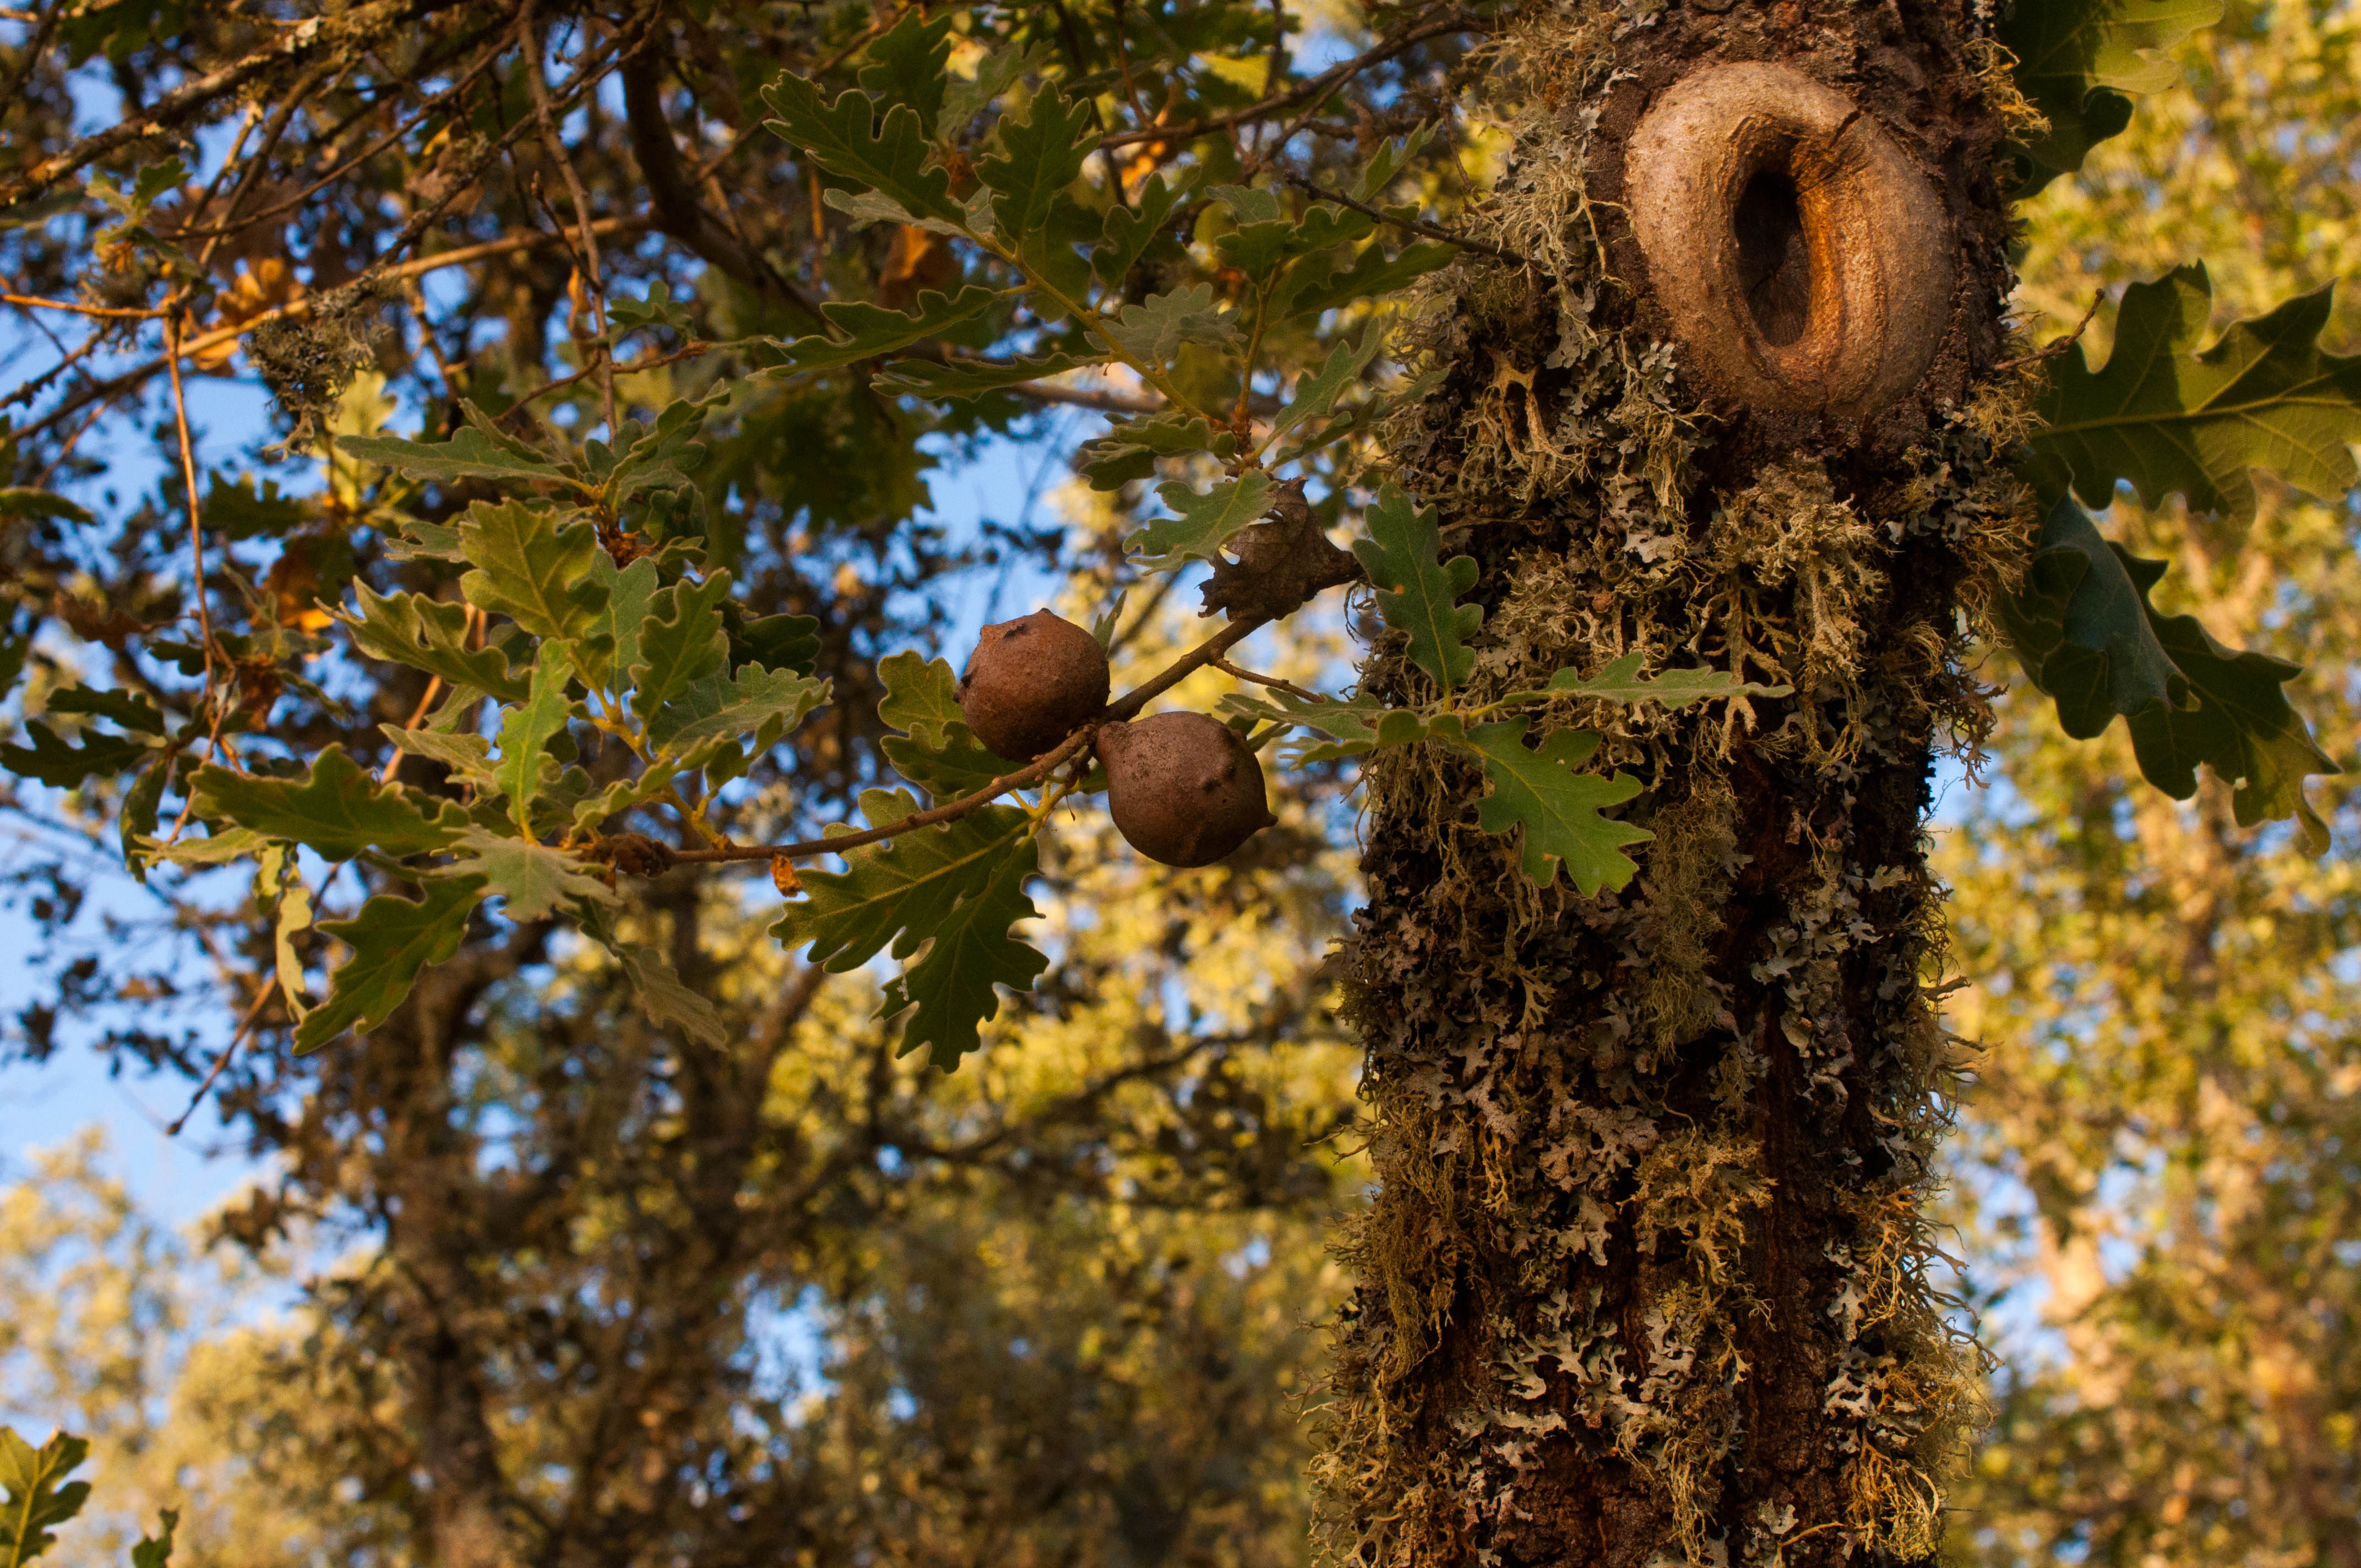 Quercus pyrenaica Las Obreras de Aliste